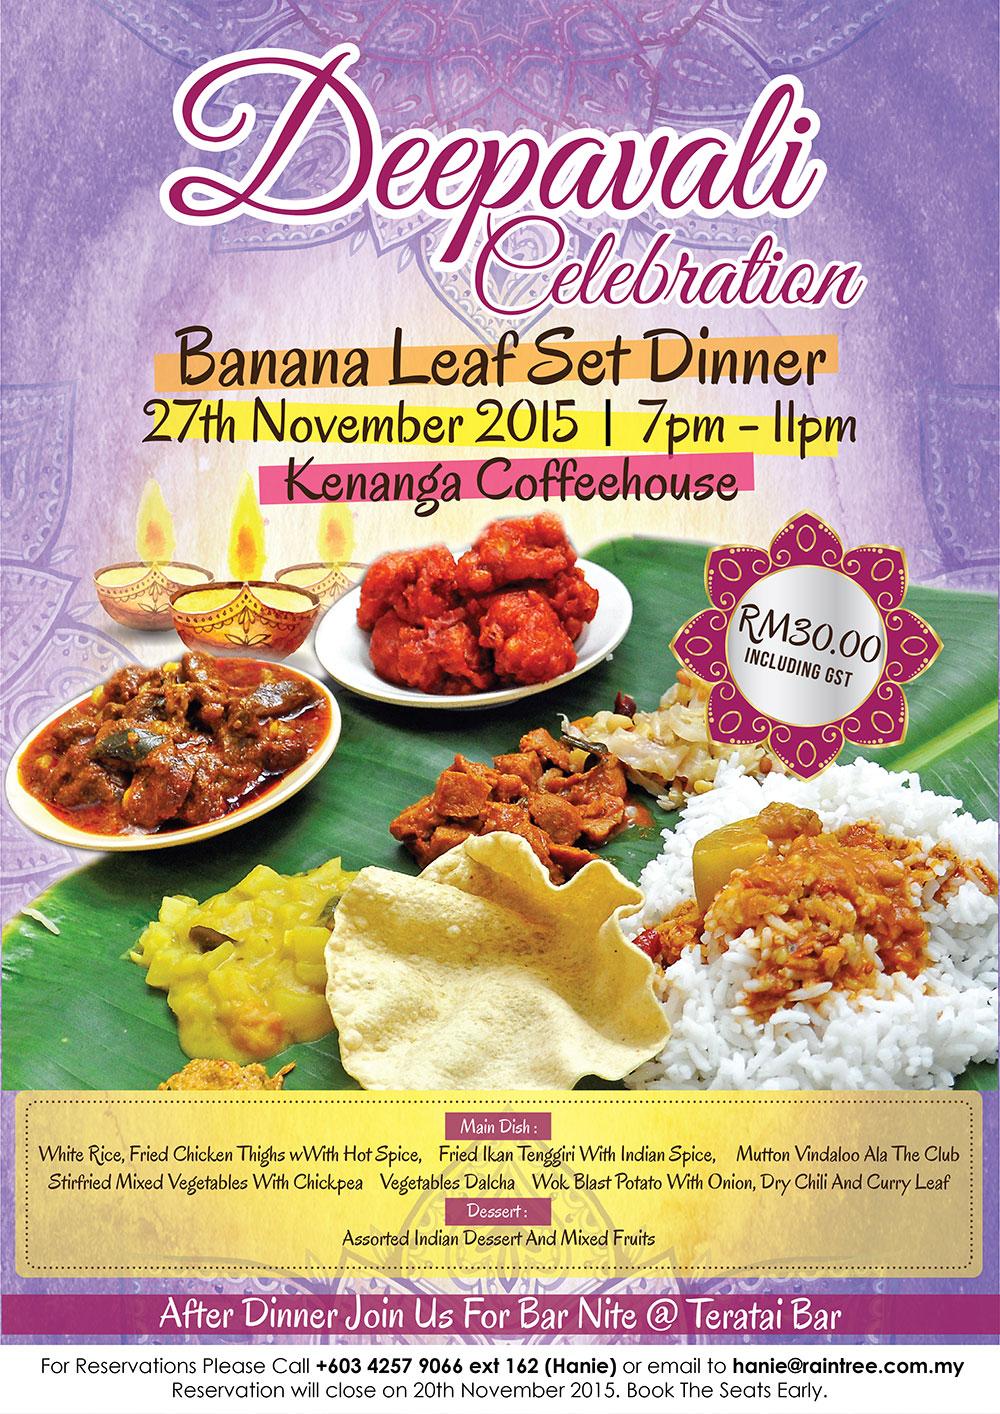 1_Deepavali-Celebration-Poster-01